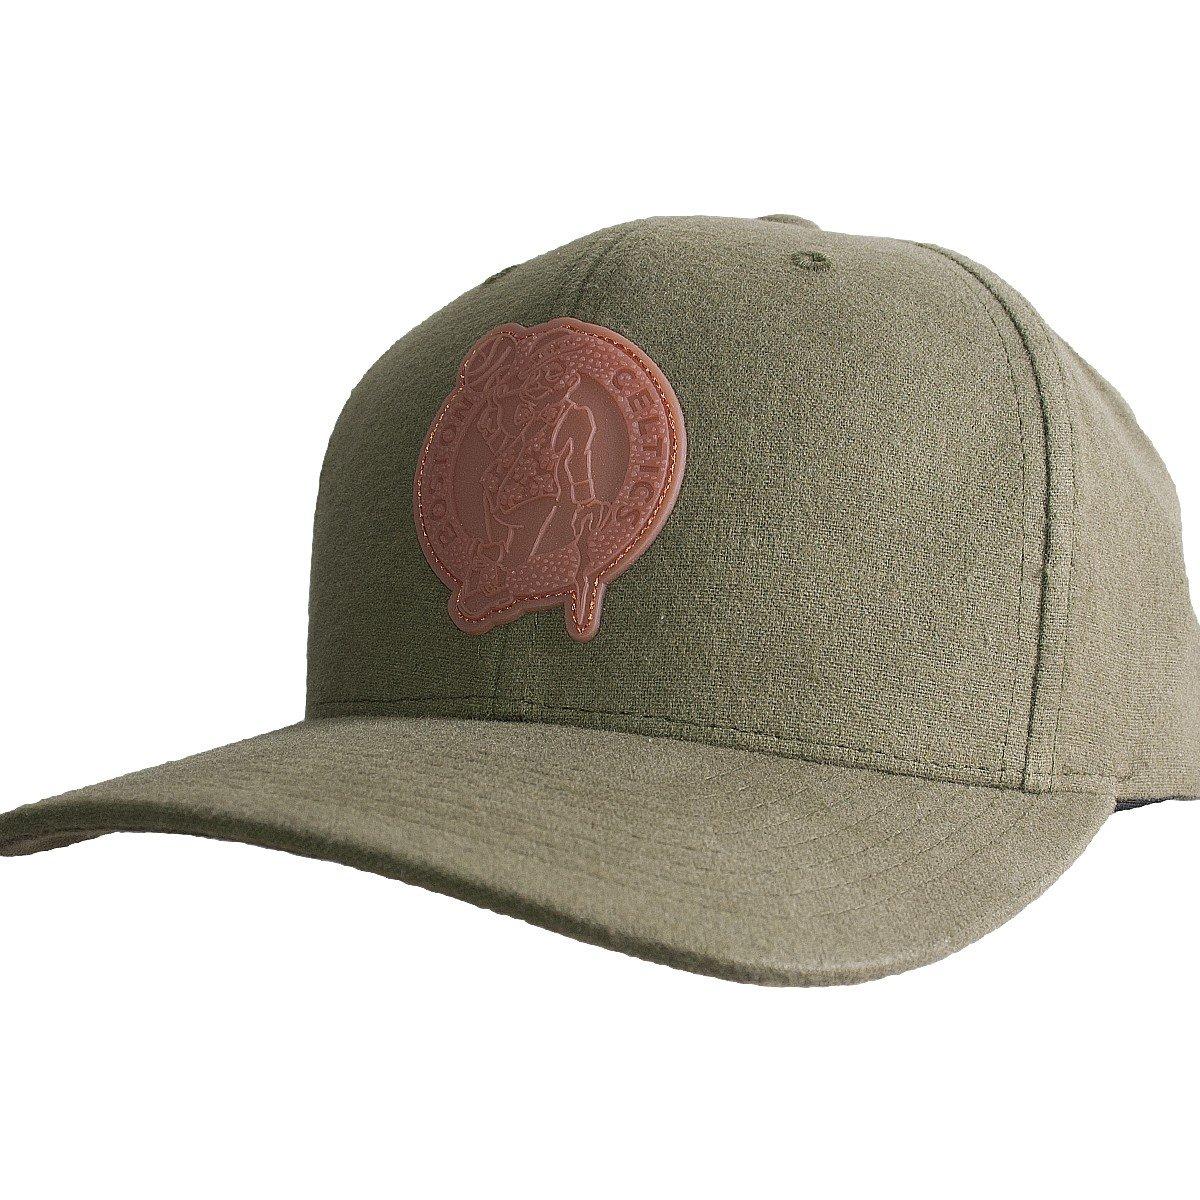 Boné Mitchell   Ness Boston Celtics - Compre Agora  1f59399aaec